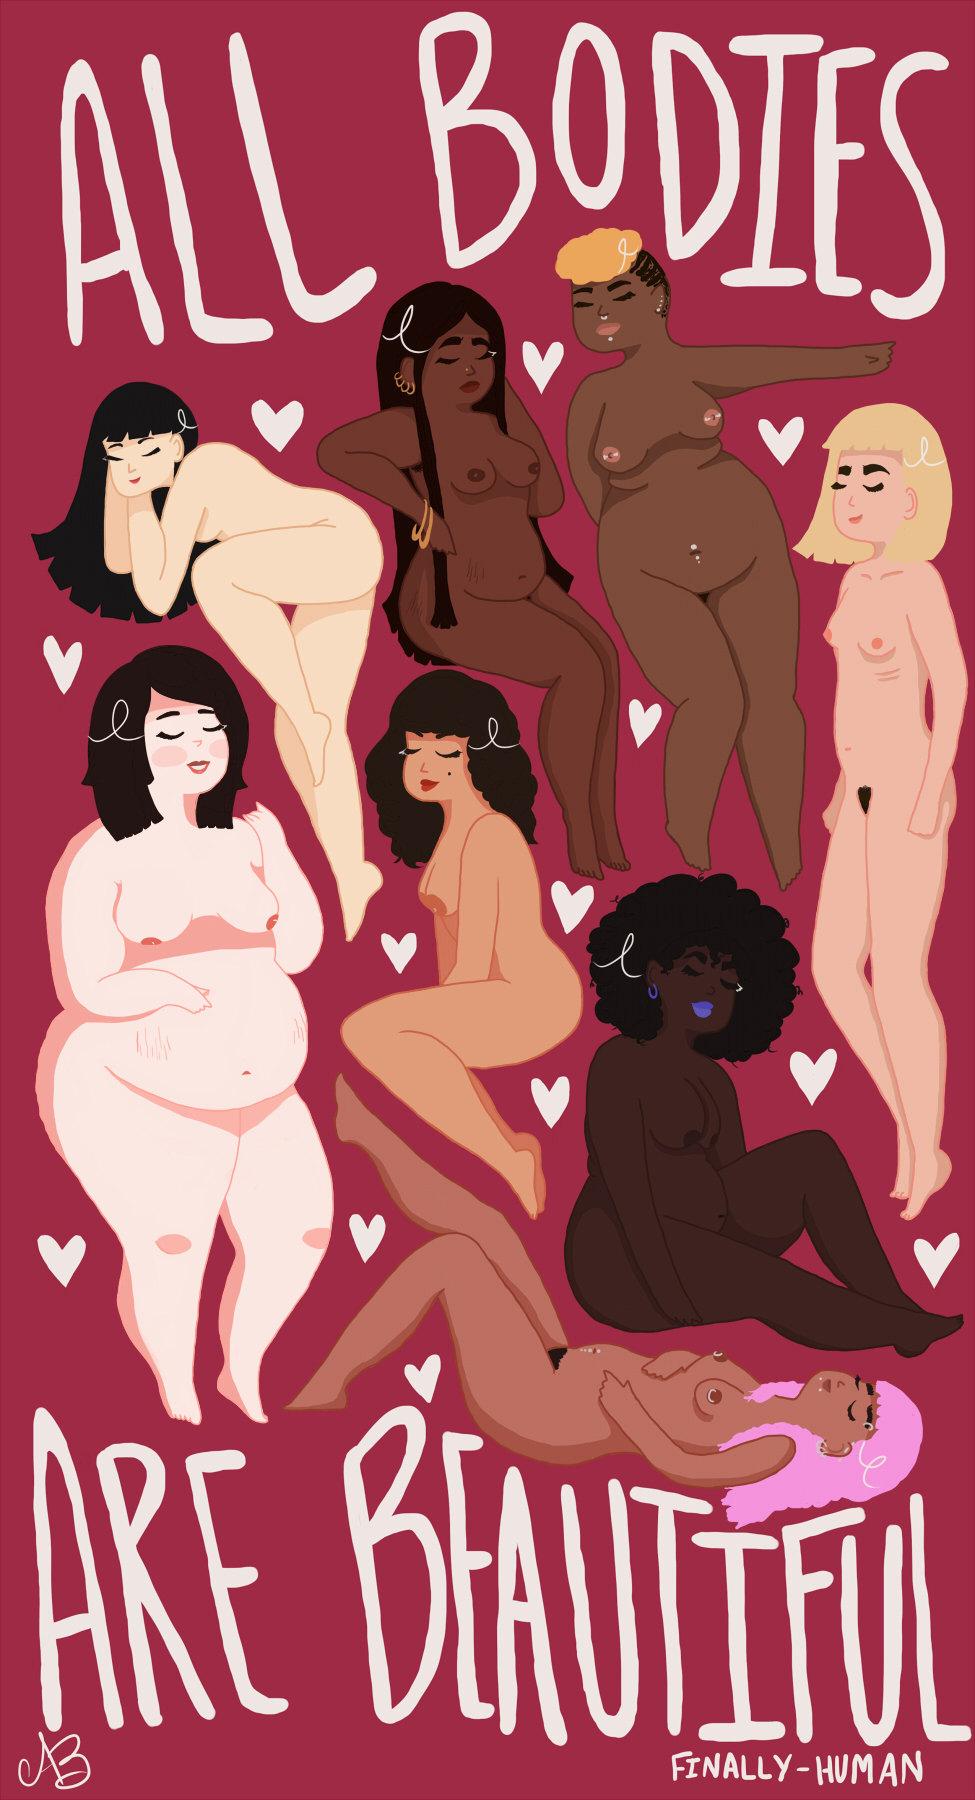 beauty art digital art body positivity diversity artists on tumblr body positive fat acceptance artists of tumblr body acceptance body love fat art chubby bunny body positive art who let me art finally-human